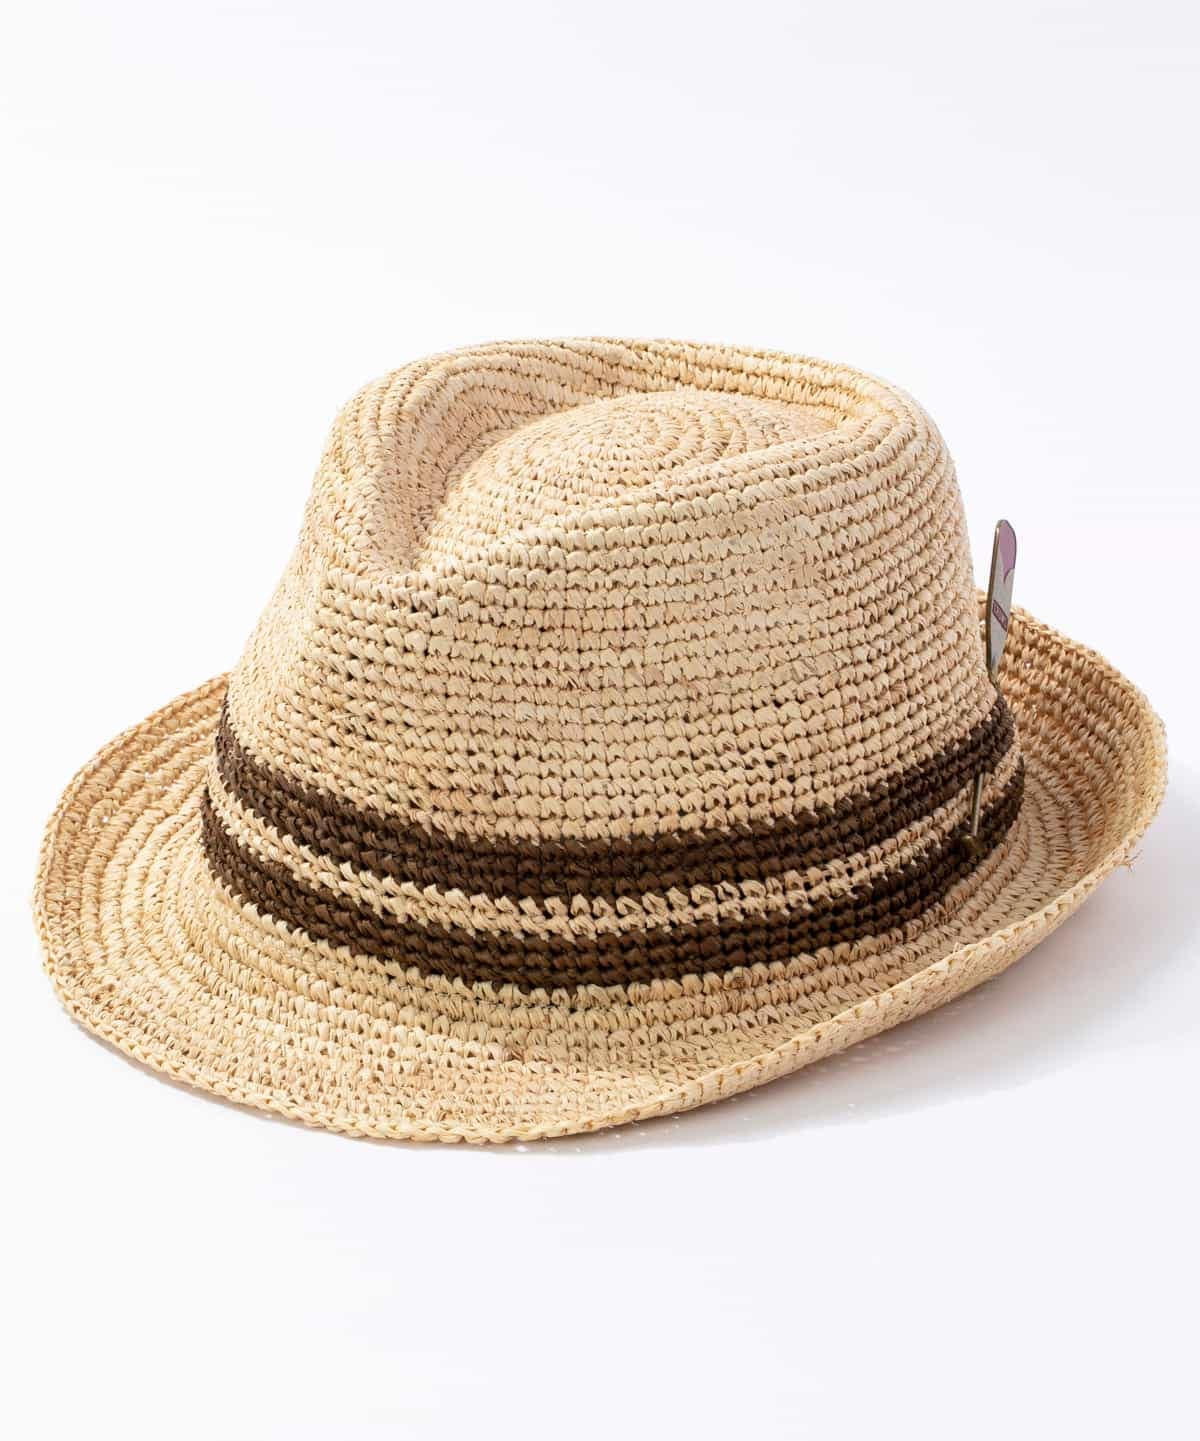 ee0839d6036819 帽子|CHUMS(チャムス)|アウトドアファッション公式通販